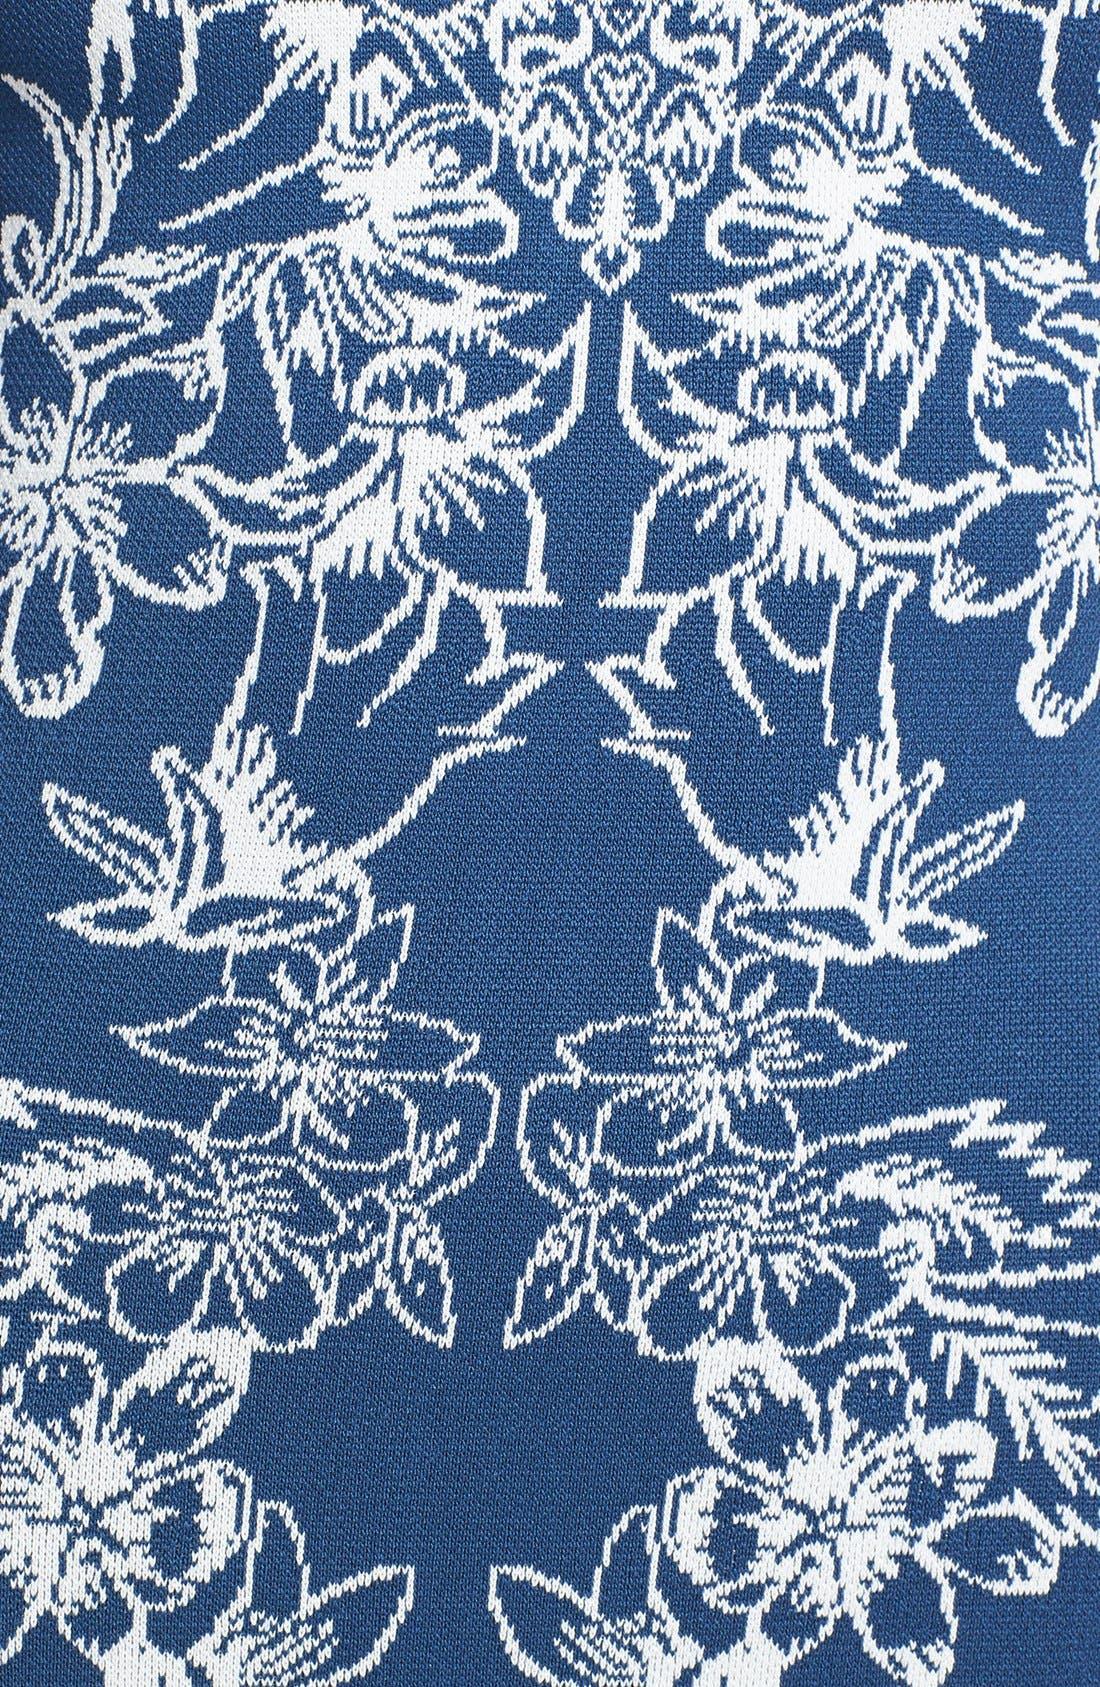 Alternate Image 3  - BCBGMAXAZRIA Floral Jacquard Body-Con Dress